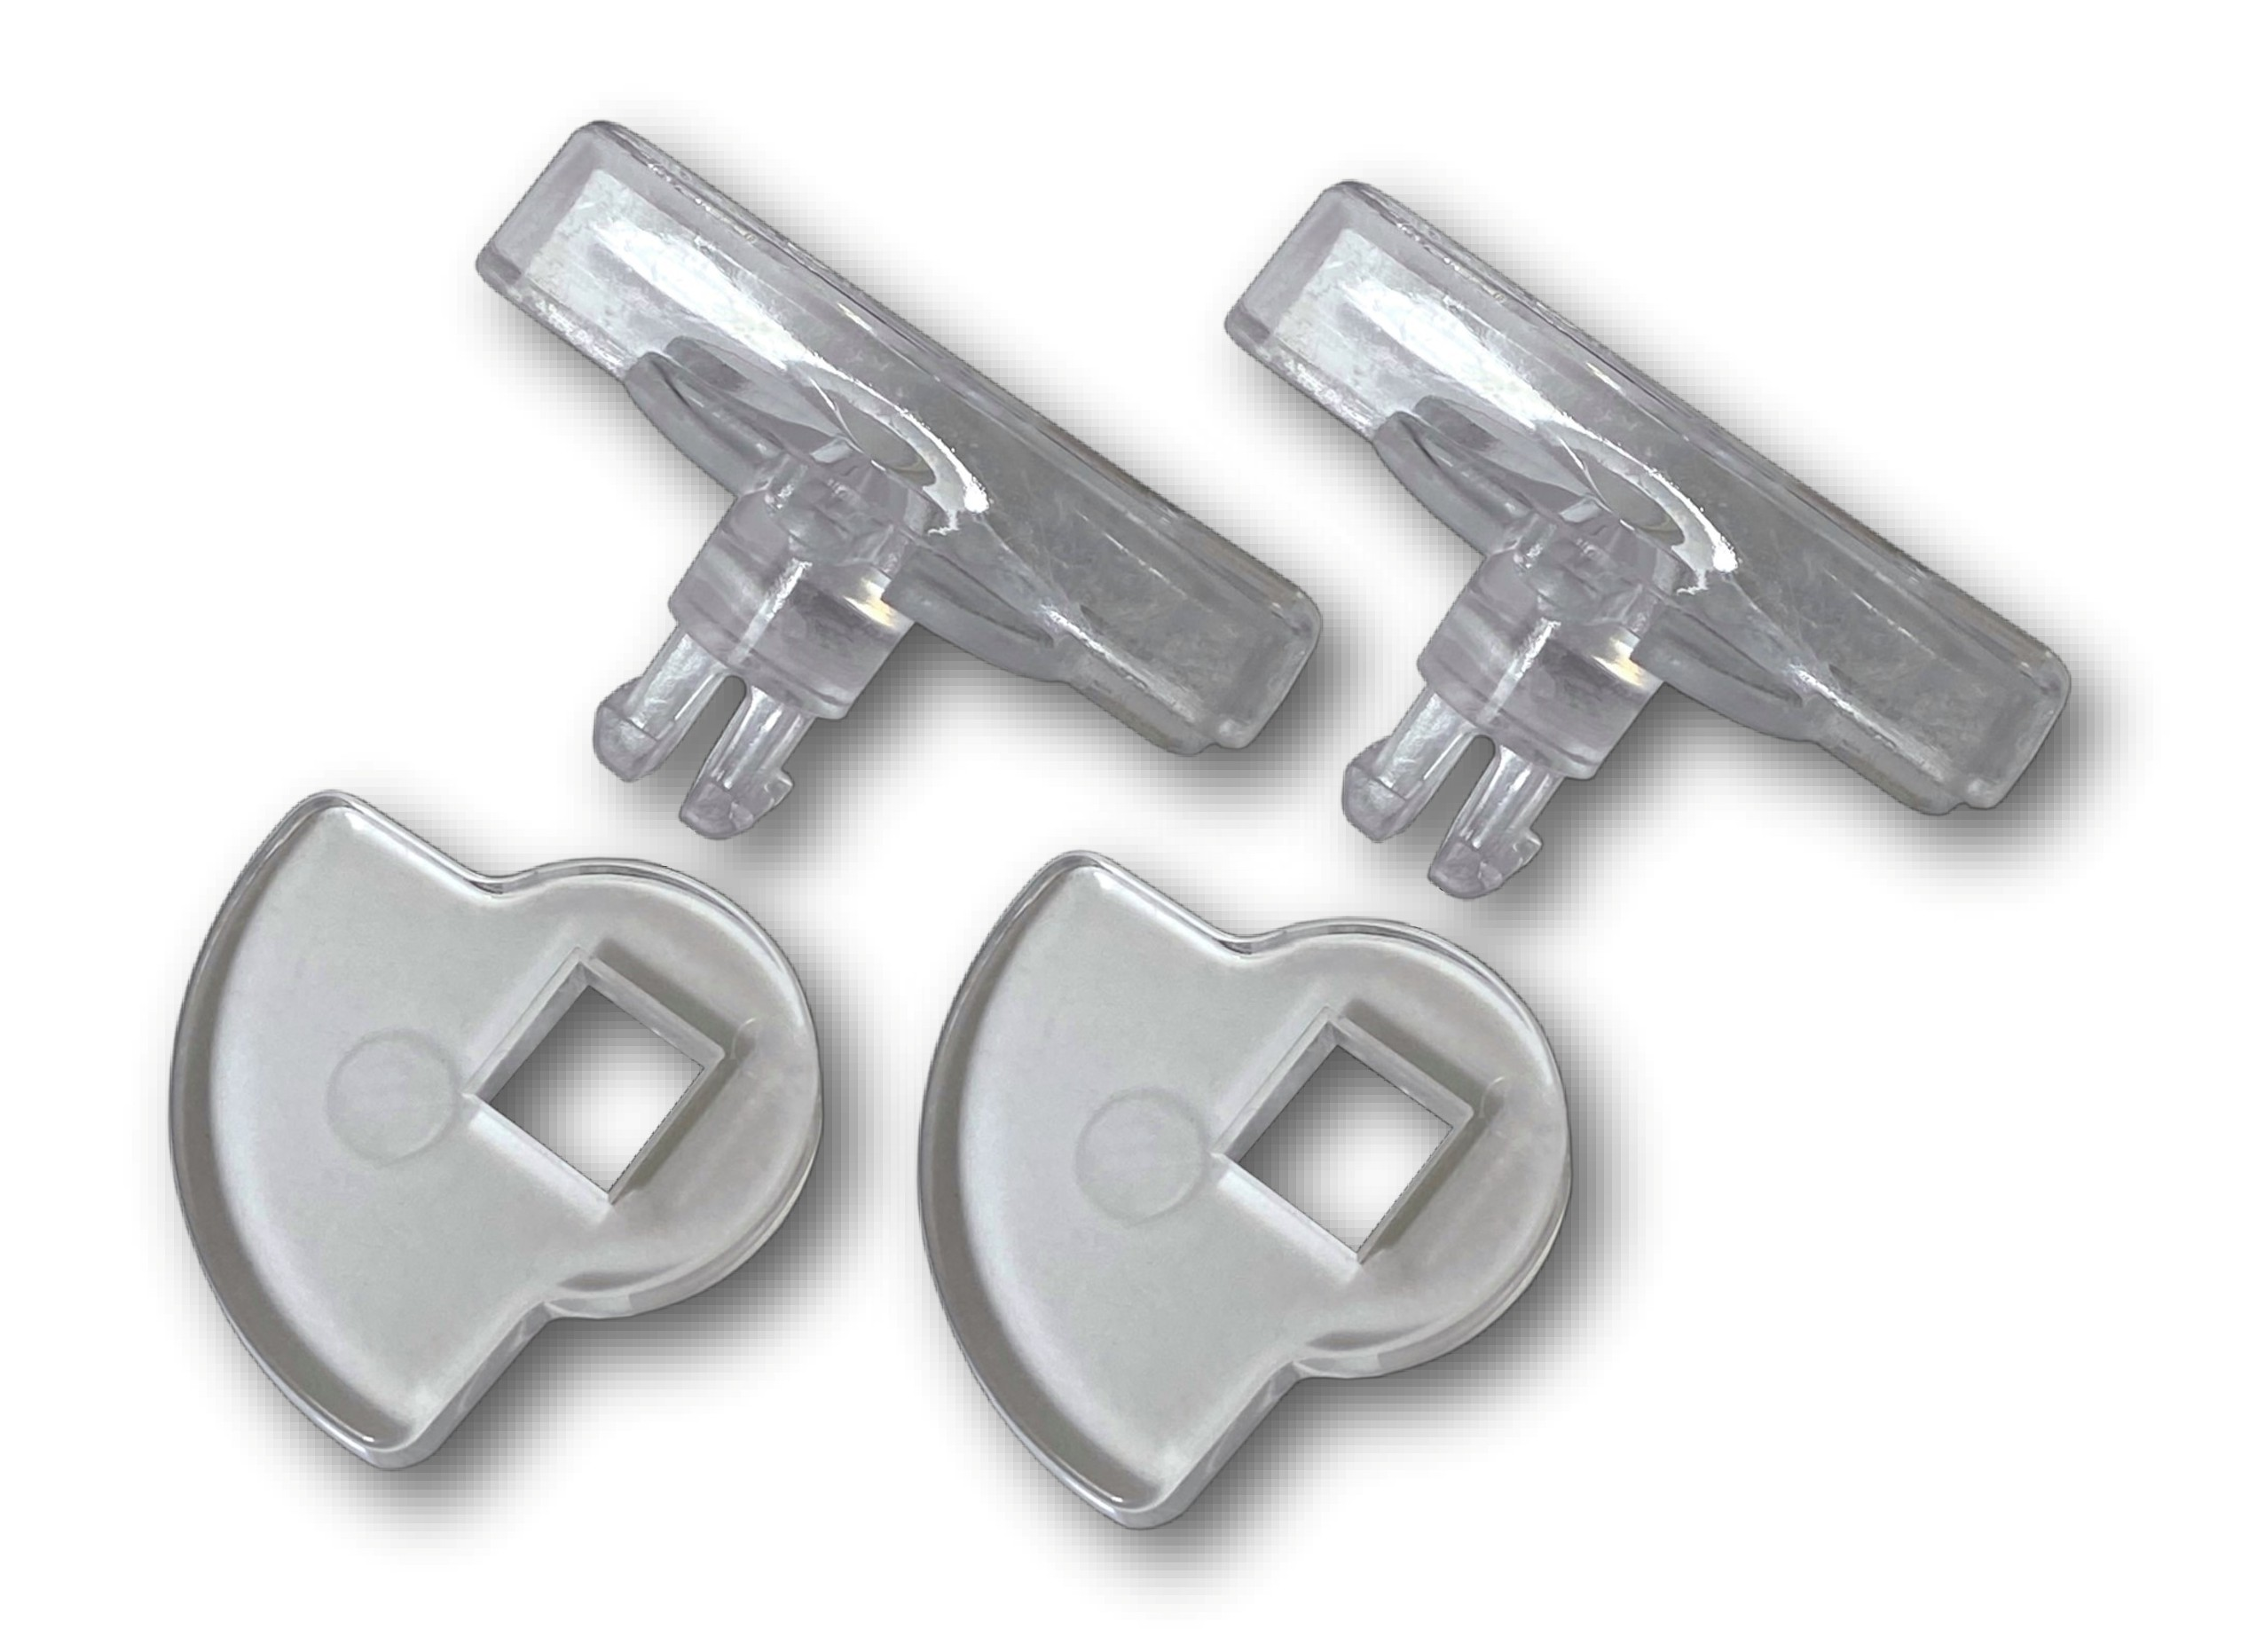 G-LDSDDC Glass fitting maxi pet door locking dial set clear